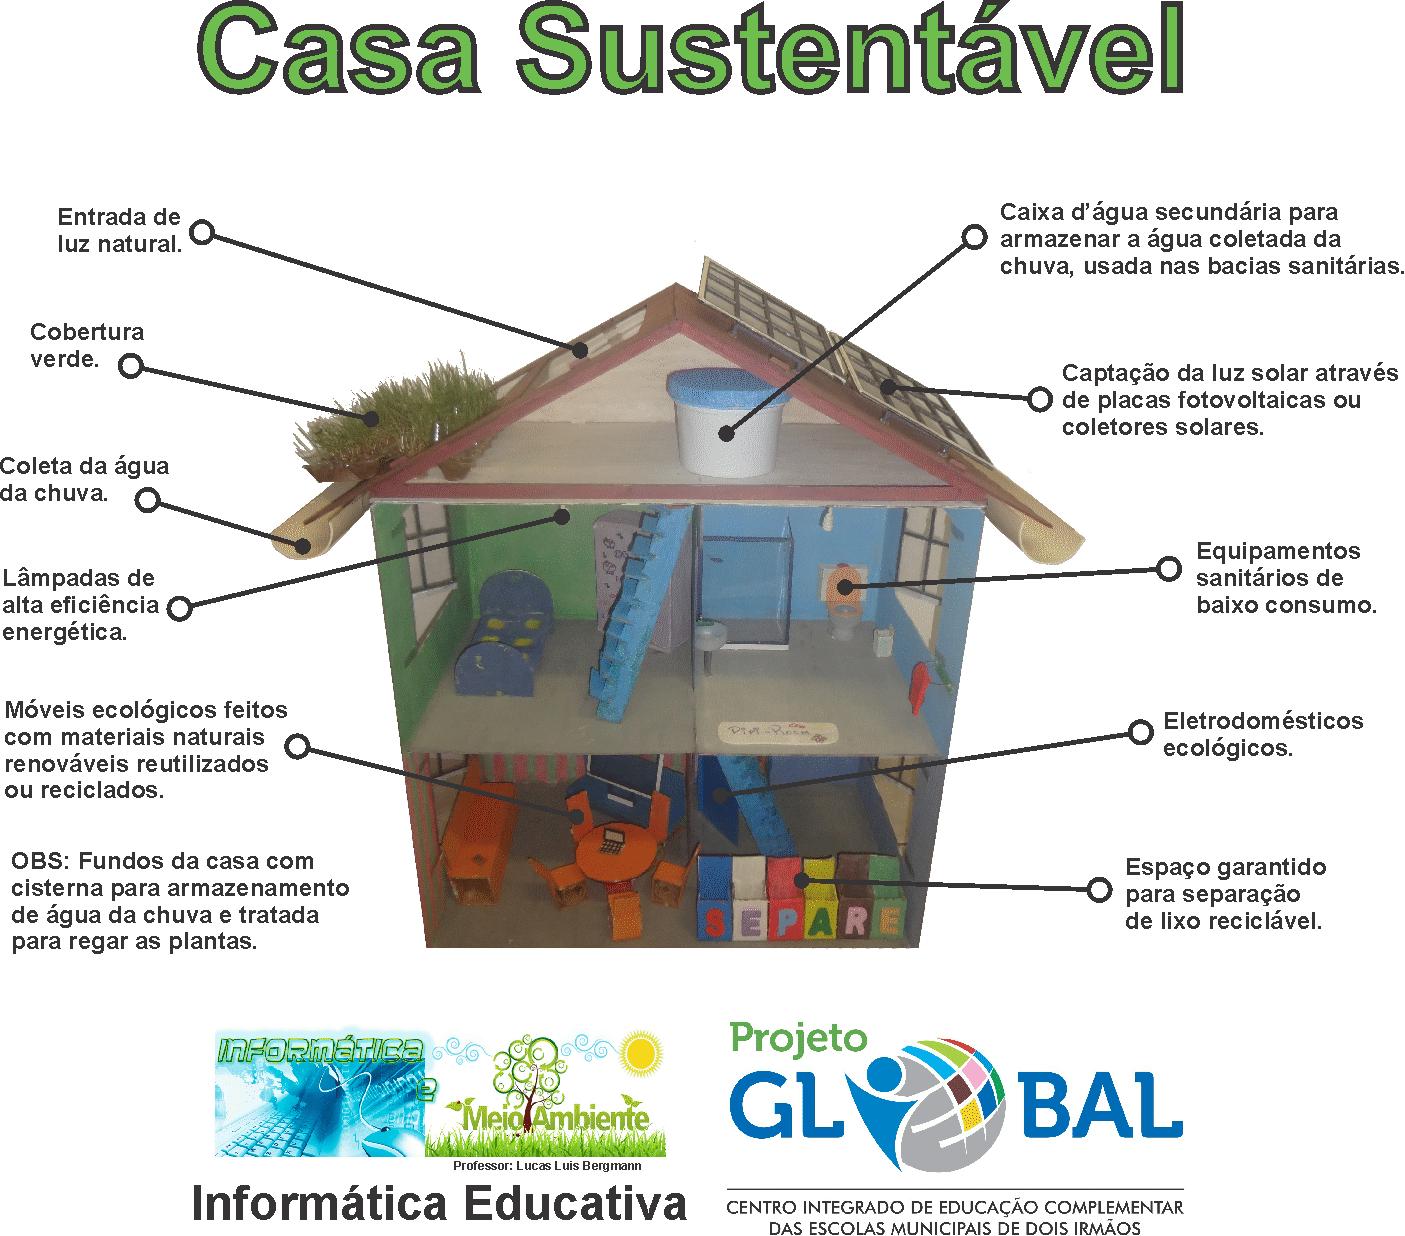 Projeto Global: Informática Educativa #0B7BBA 1405 1236